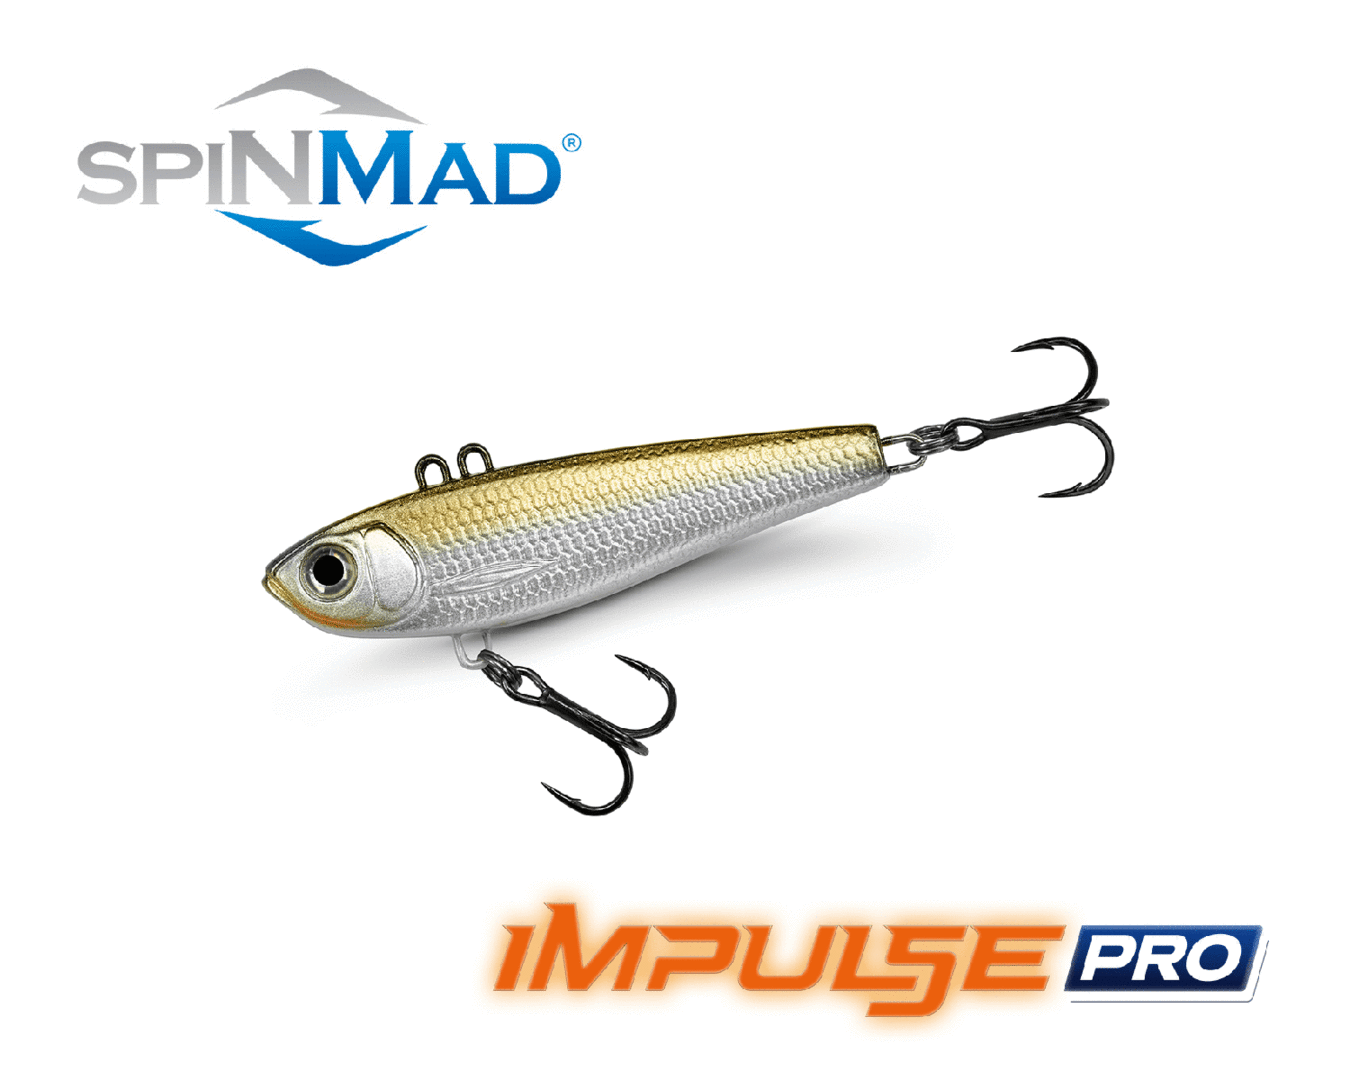 Spinmad Impulse Pro 2802